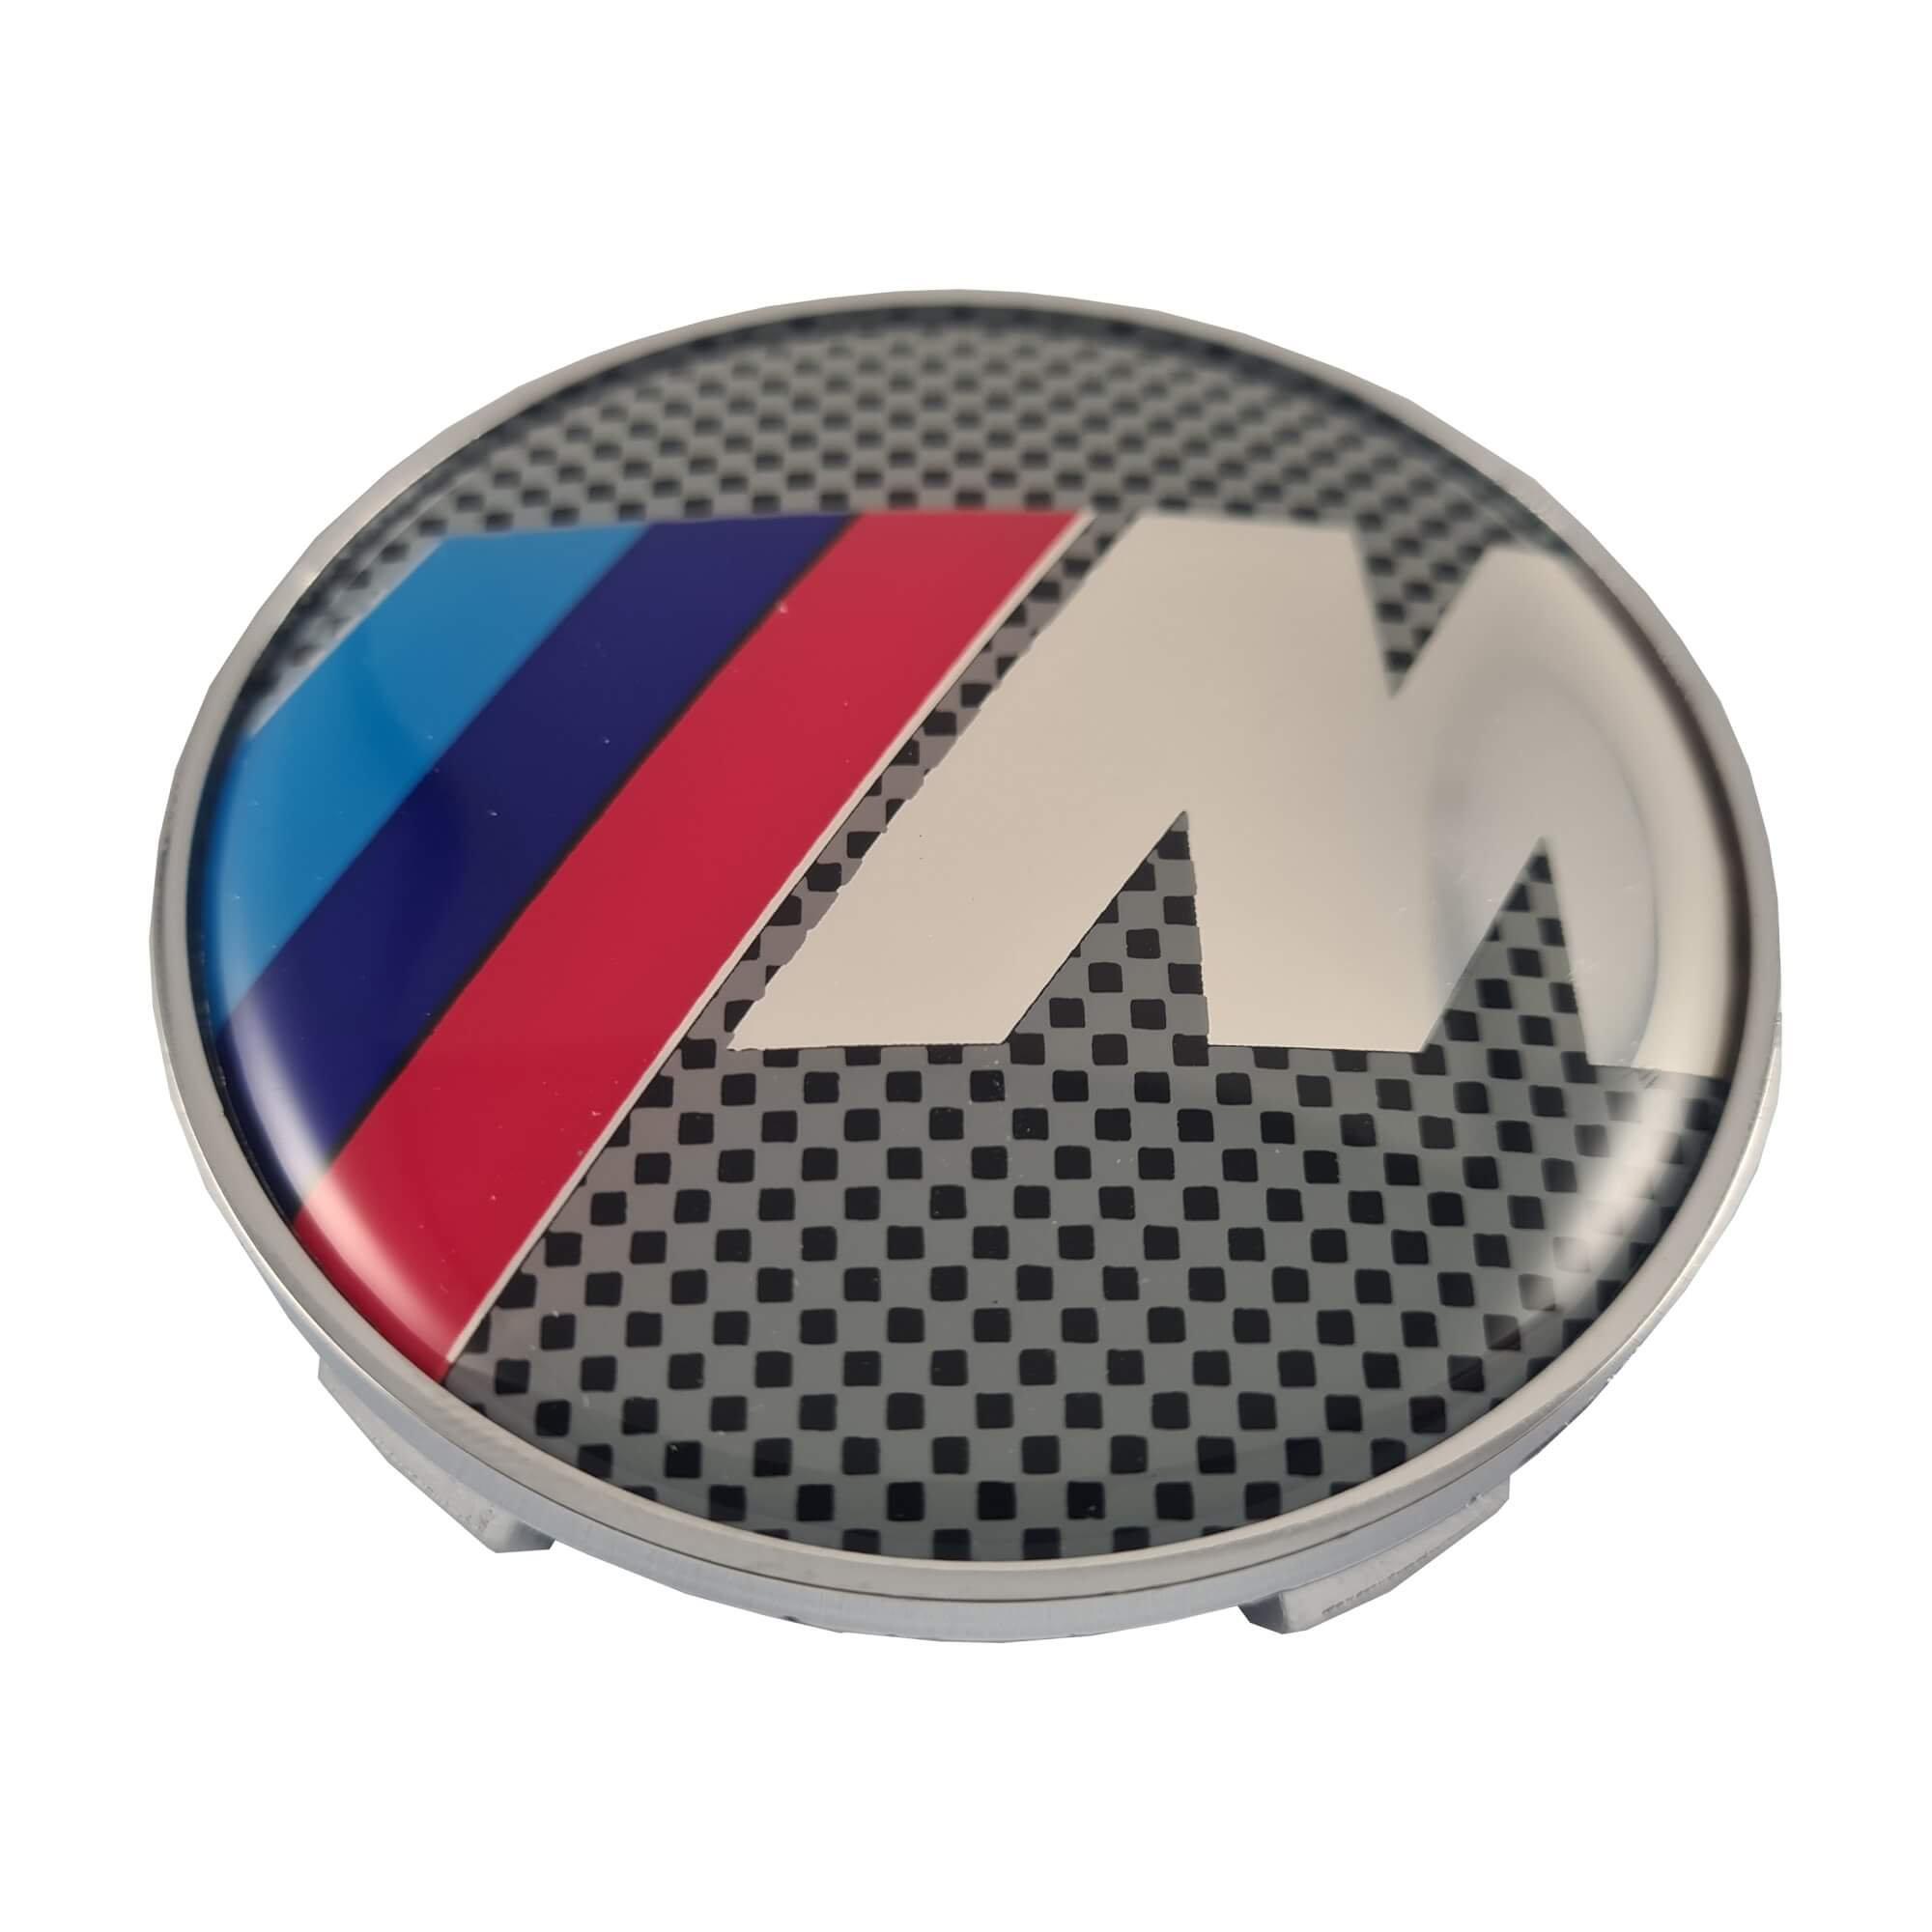 Alpina LUDOSTREET ref0003 Logo Emblema Insignia Anagrama Llanta Rueda Auto Coche Compatible con BMW 68mm 5 Pins